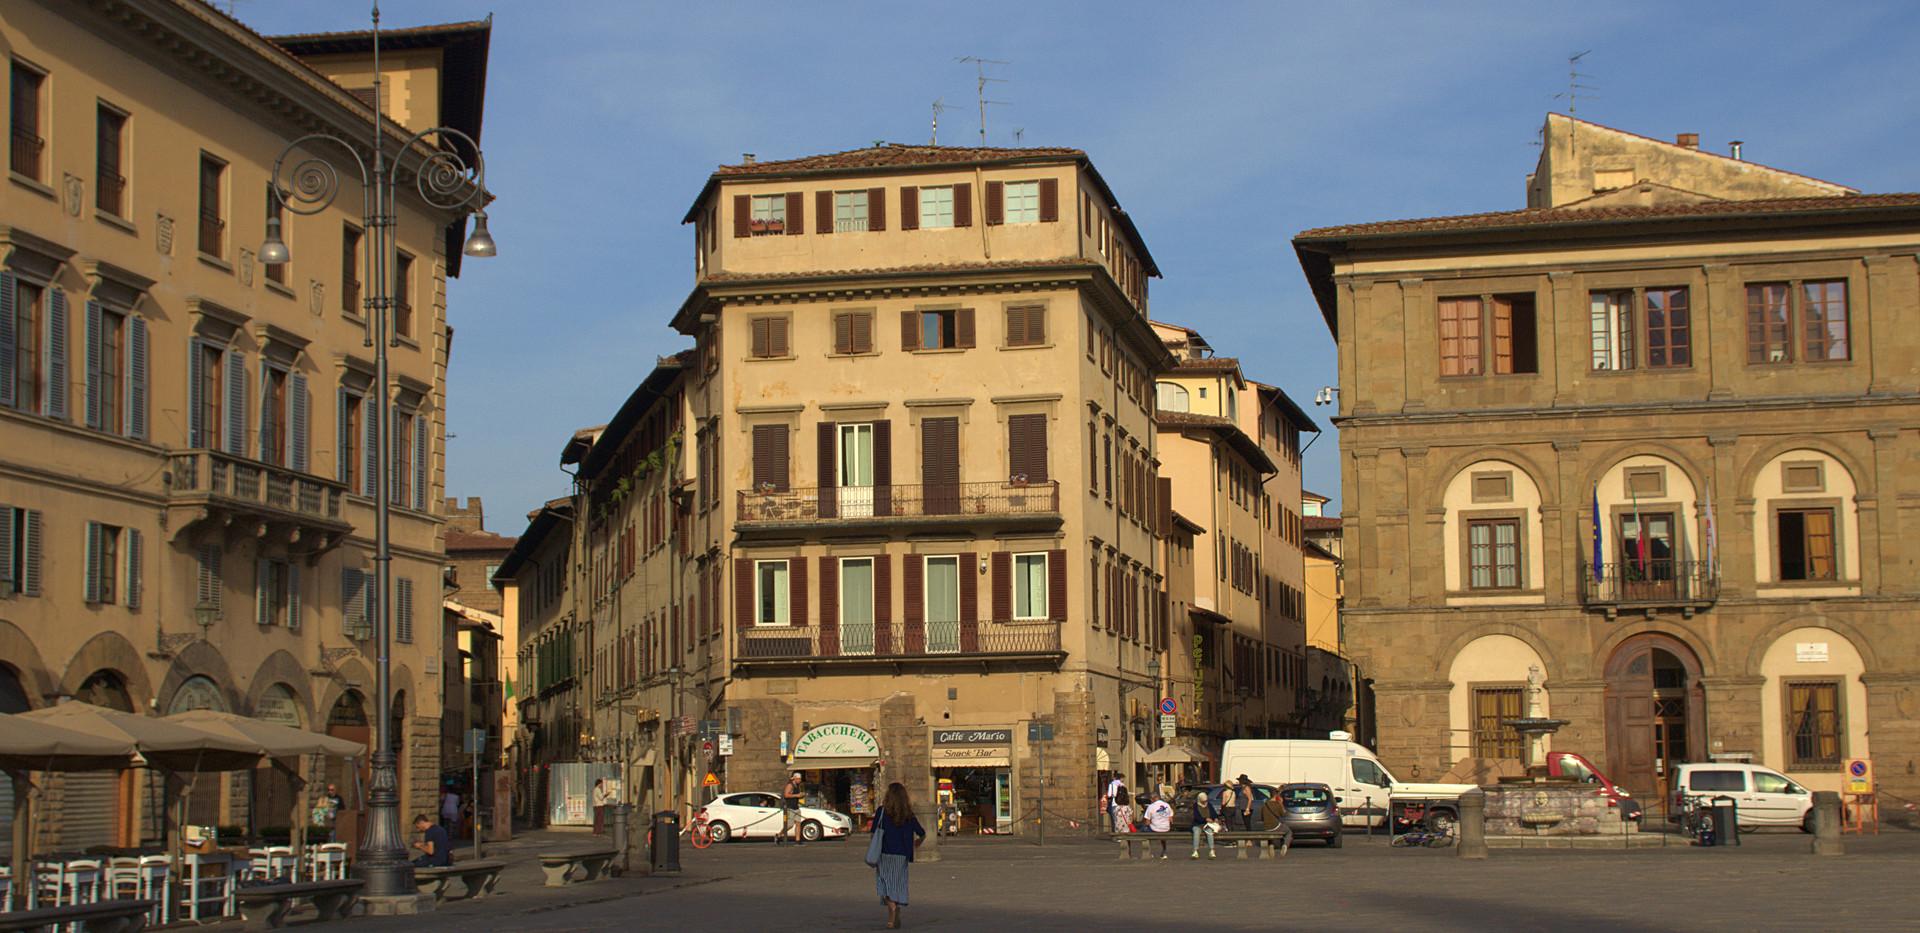 piazzasantacroce2.jpg